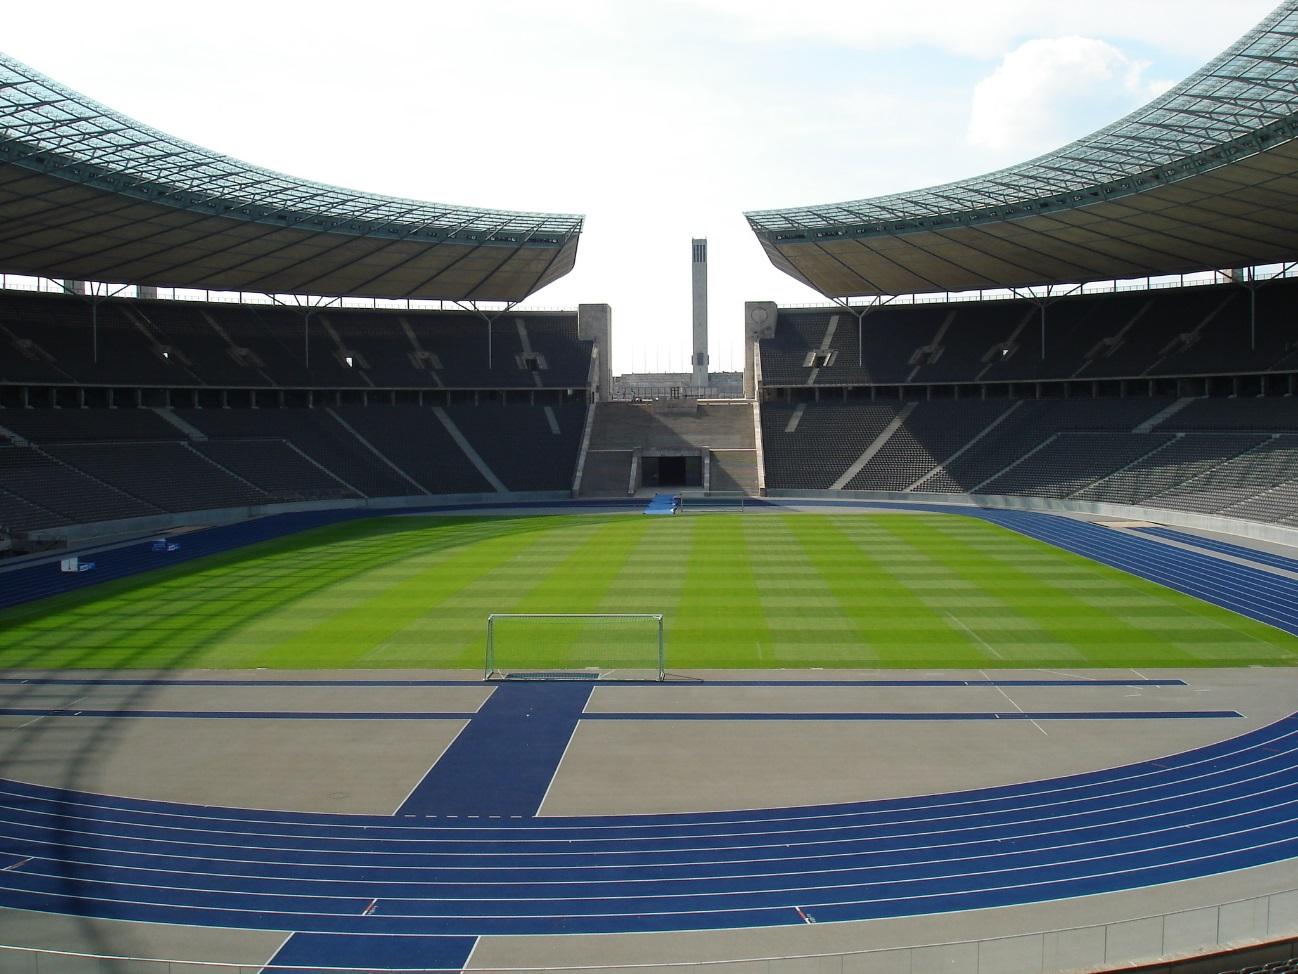 Das Finale der Champions League in Berlin